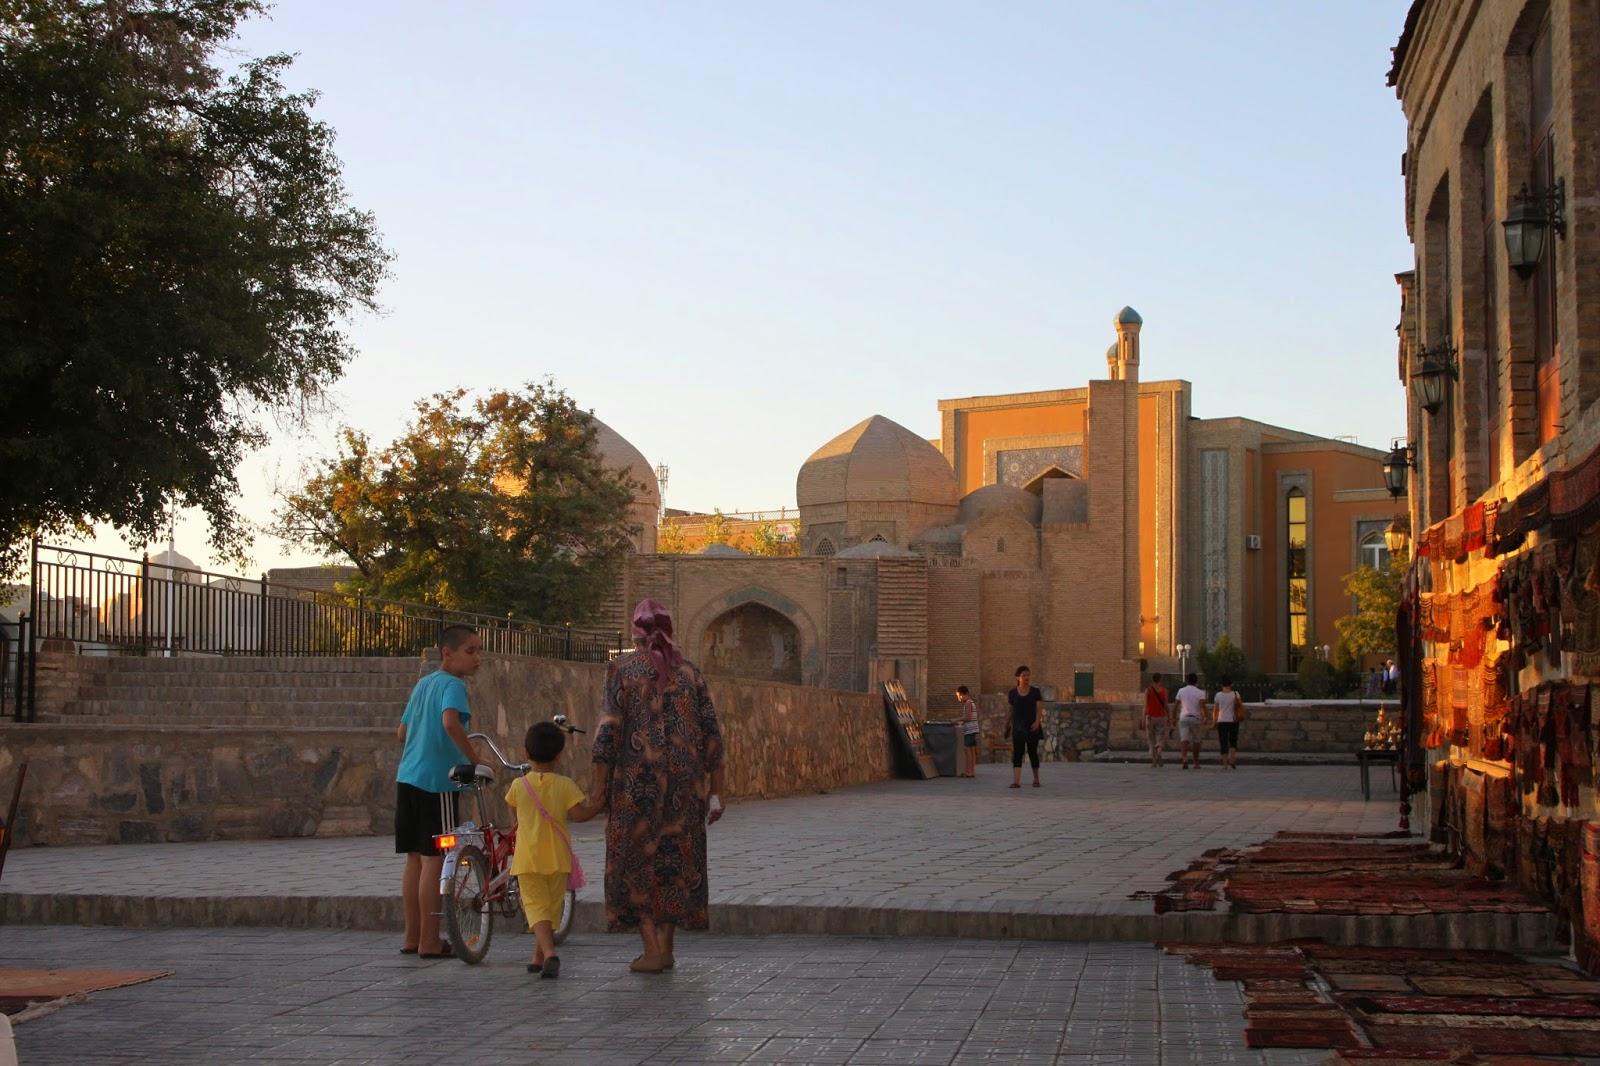 Voyage sac-au-dos/backpaking en Ouzbékistan